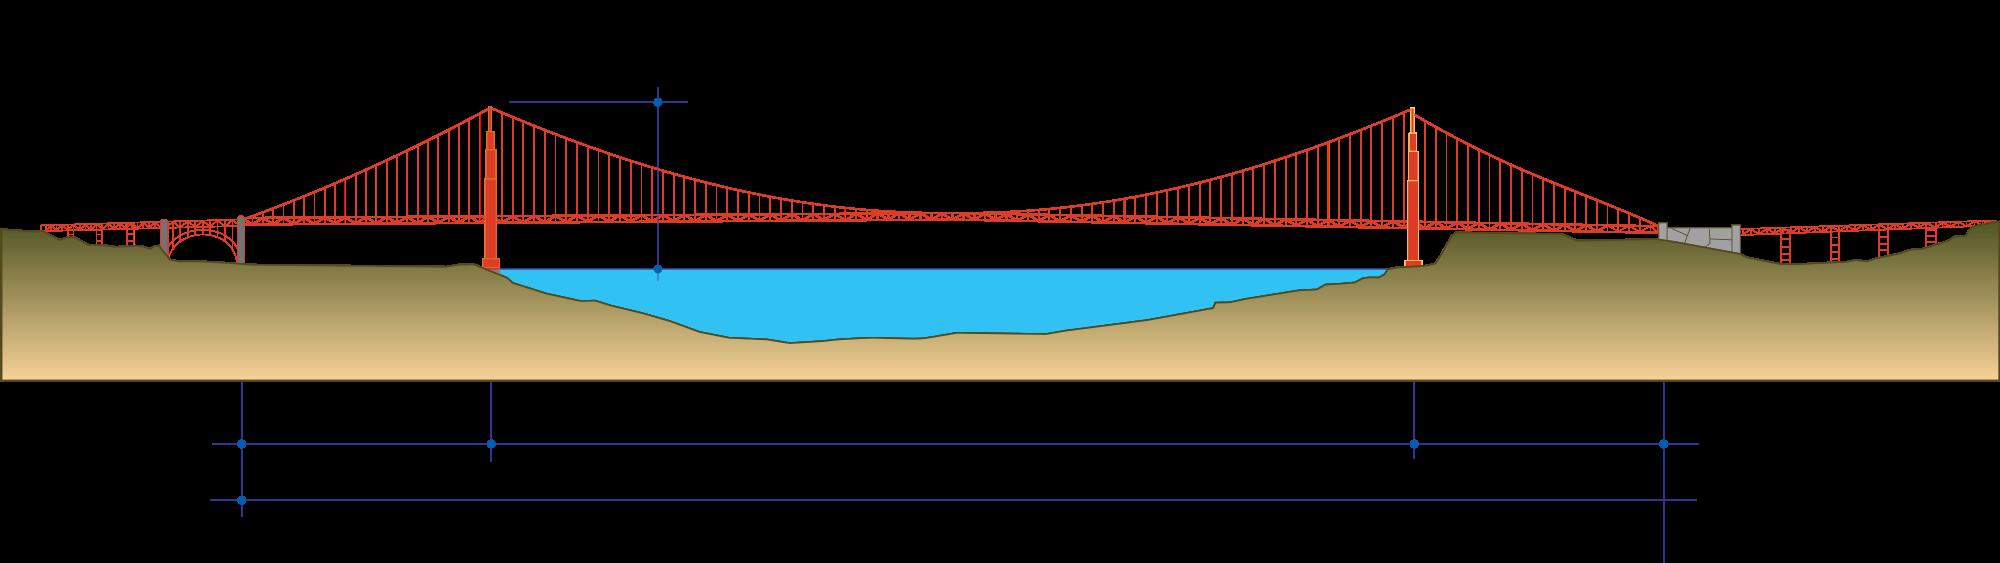 2000x563 Filegolden Gate Bridge.svg